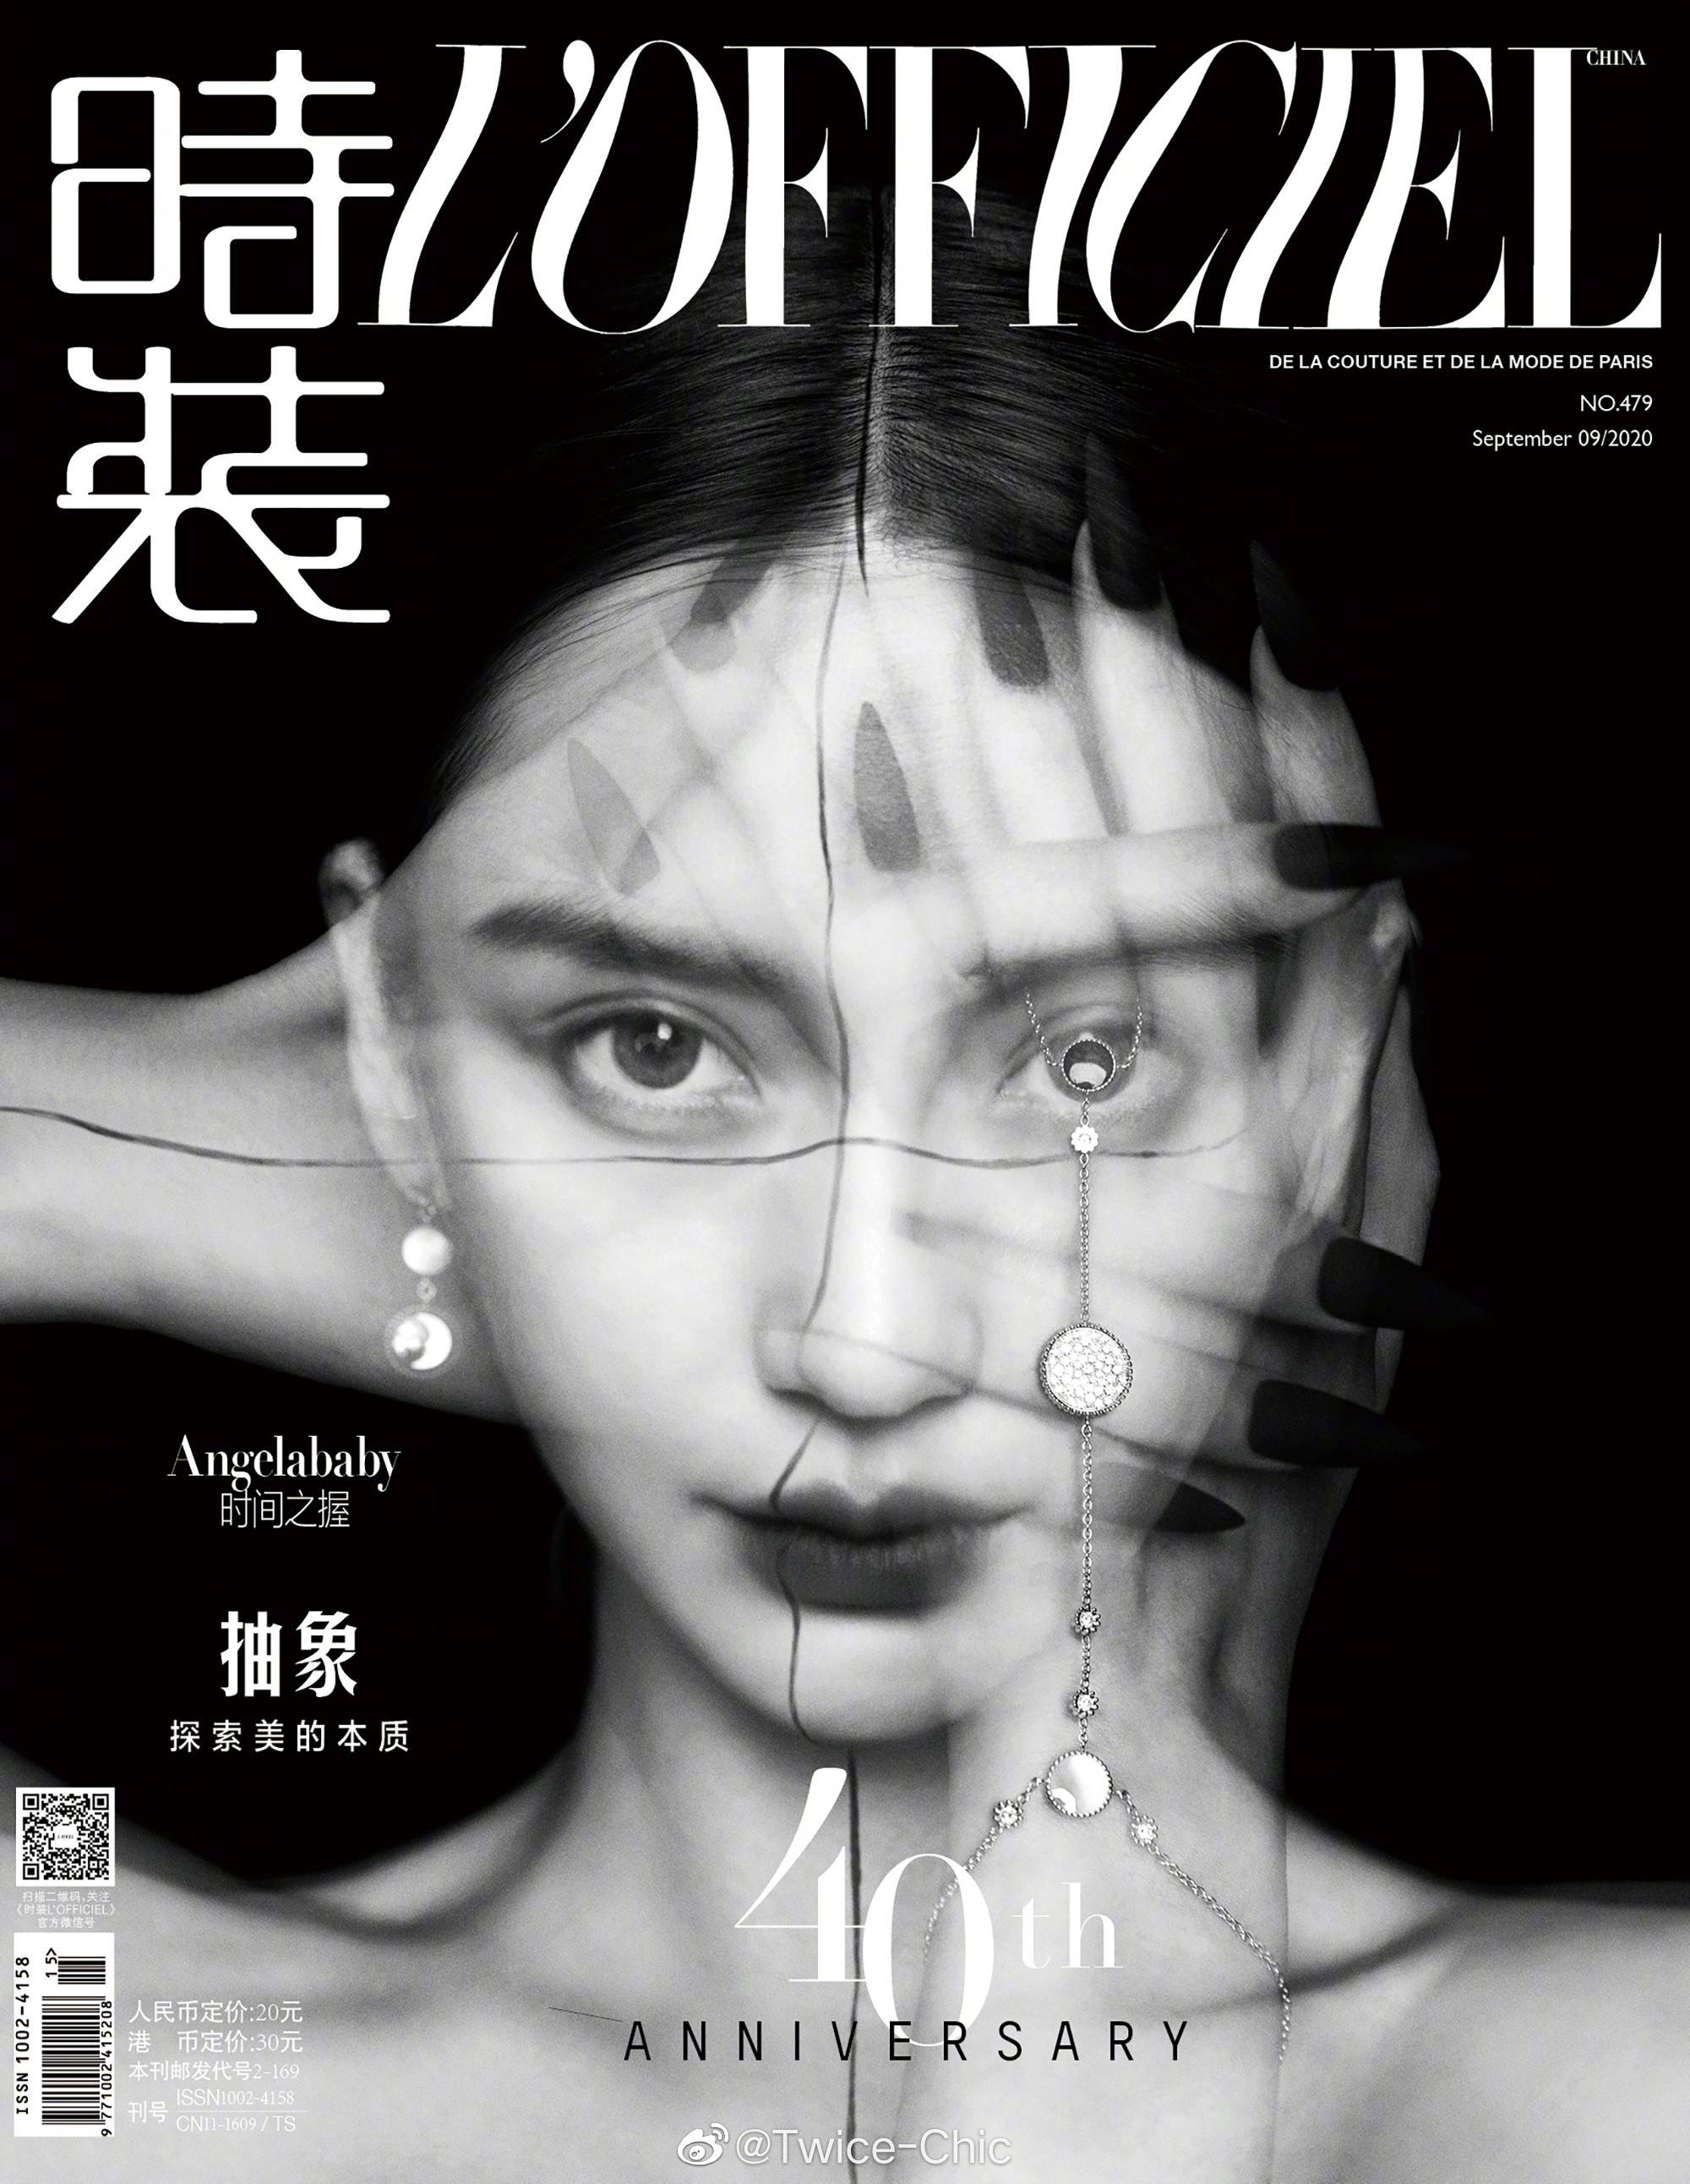 Angelababy x 时装L'OFFICIEL 9月刊 | 红唇黑与白